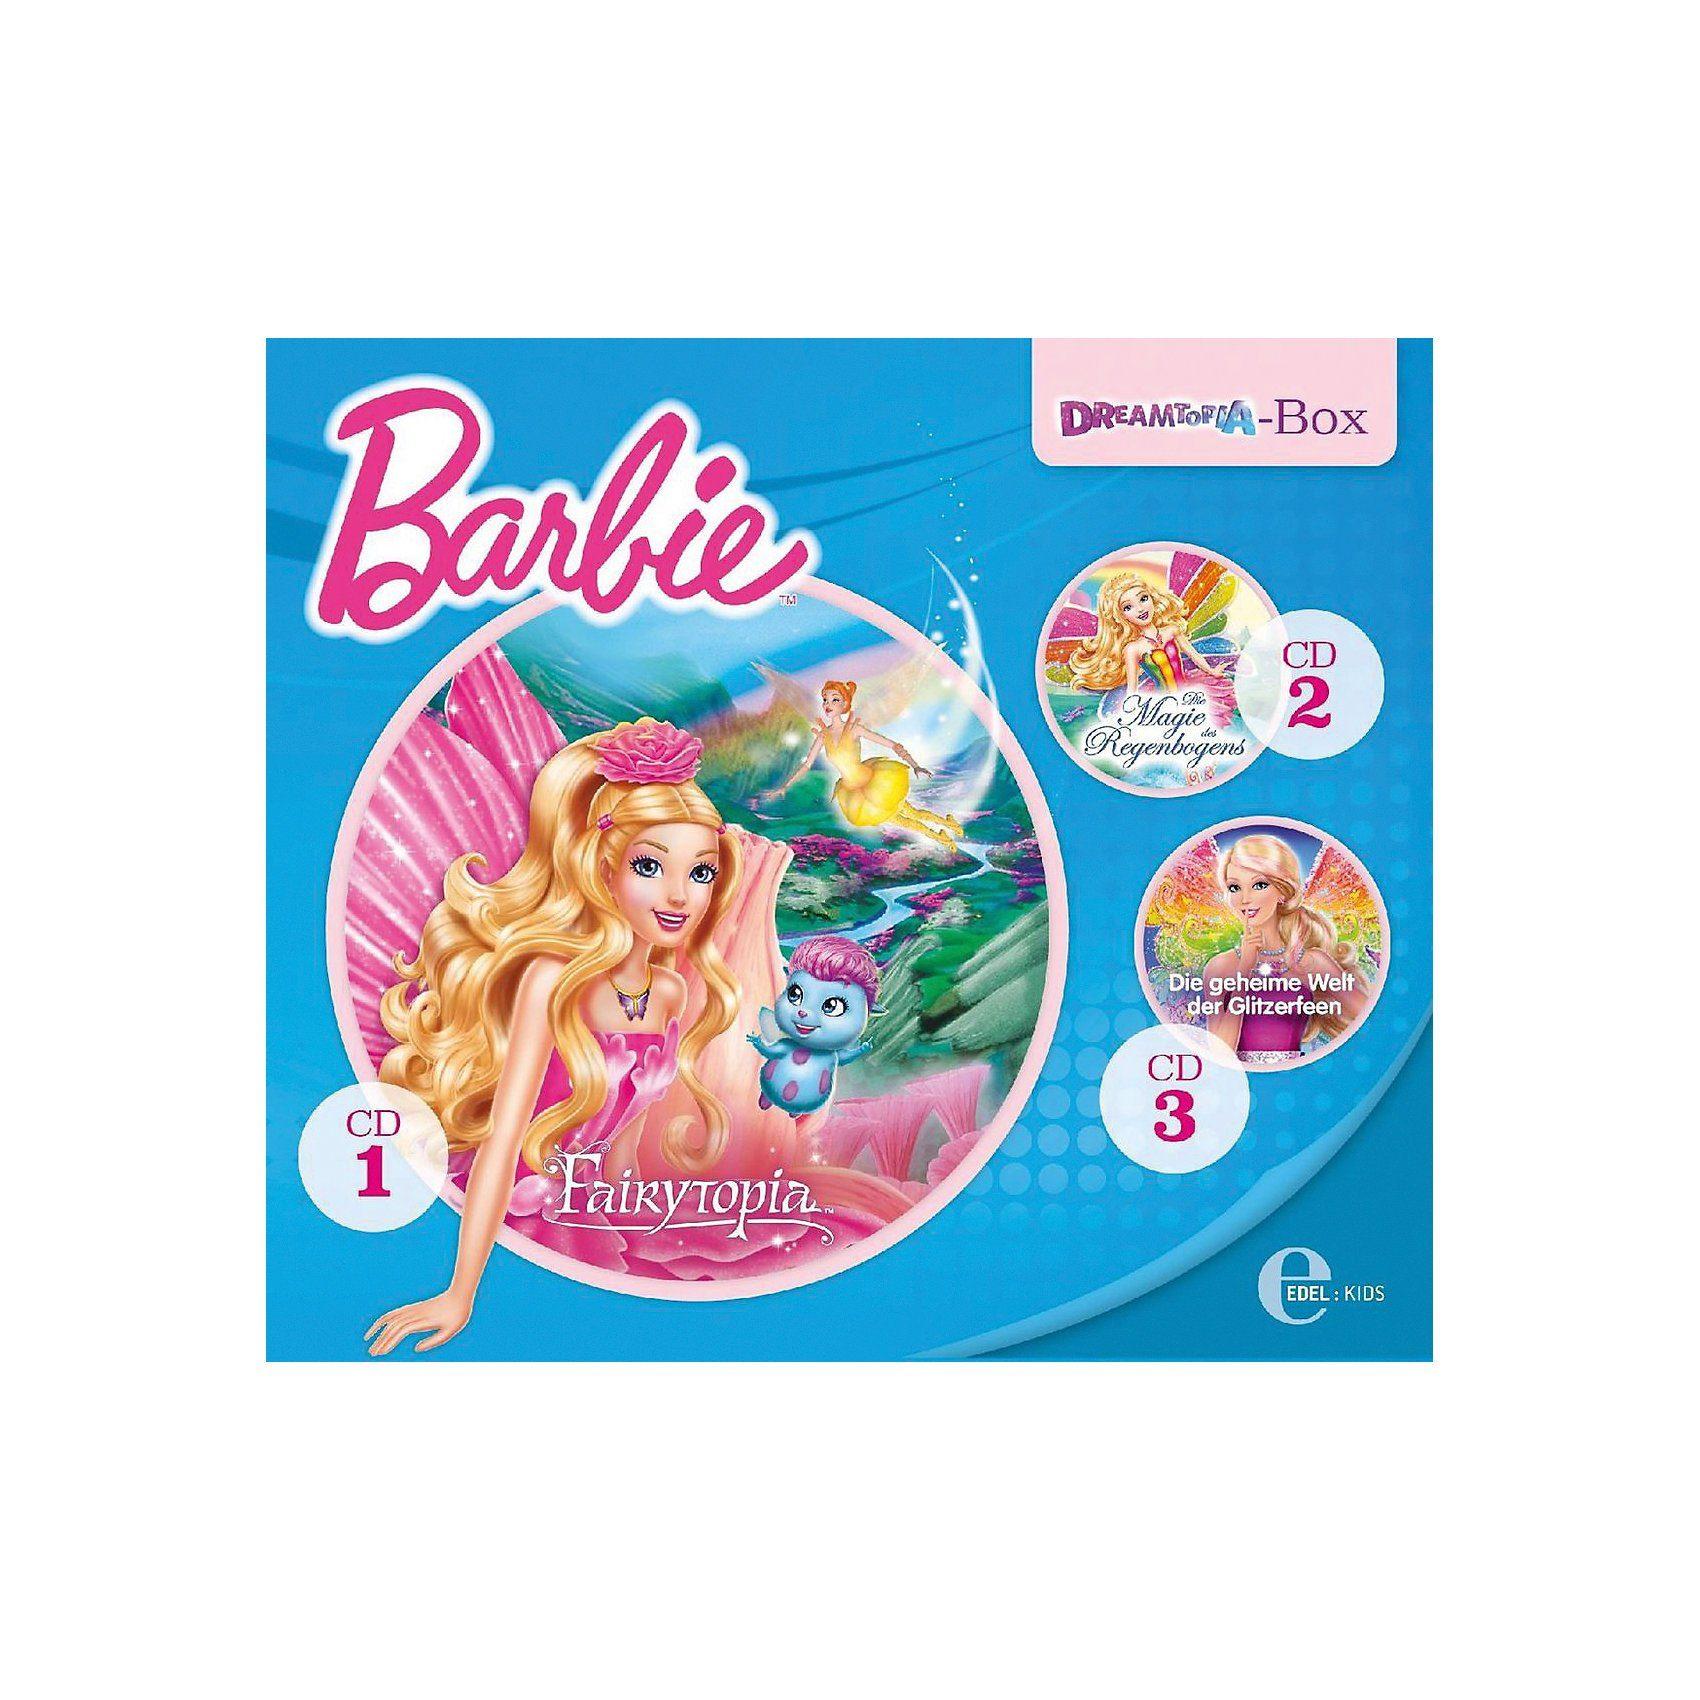 Edel CD Barbie - Dreamtopia-Box, 3 Audio-CD